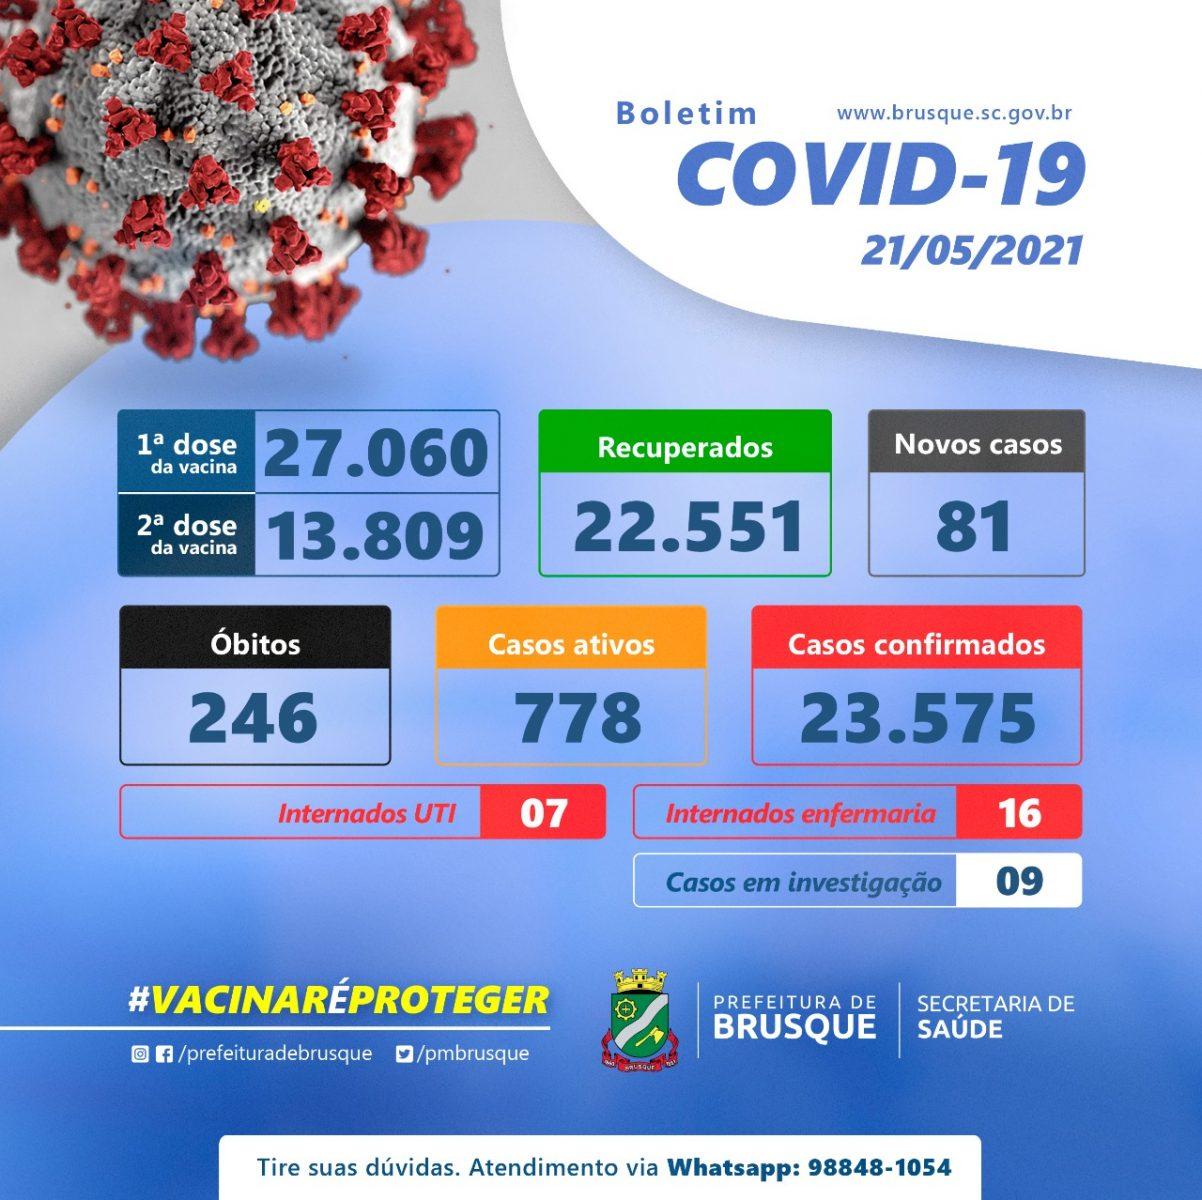 Covid-19: Confira o boletim epidemiológico desta sexta-feira (21)